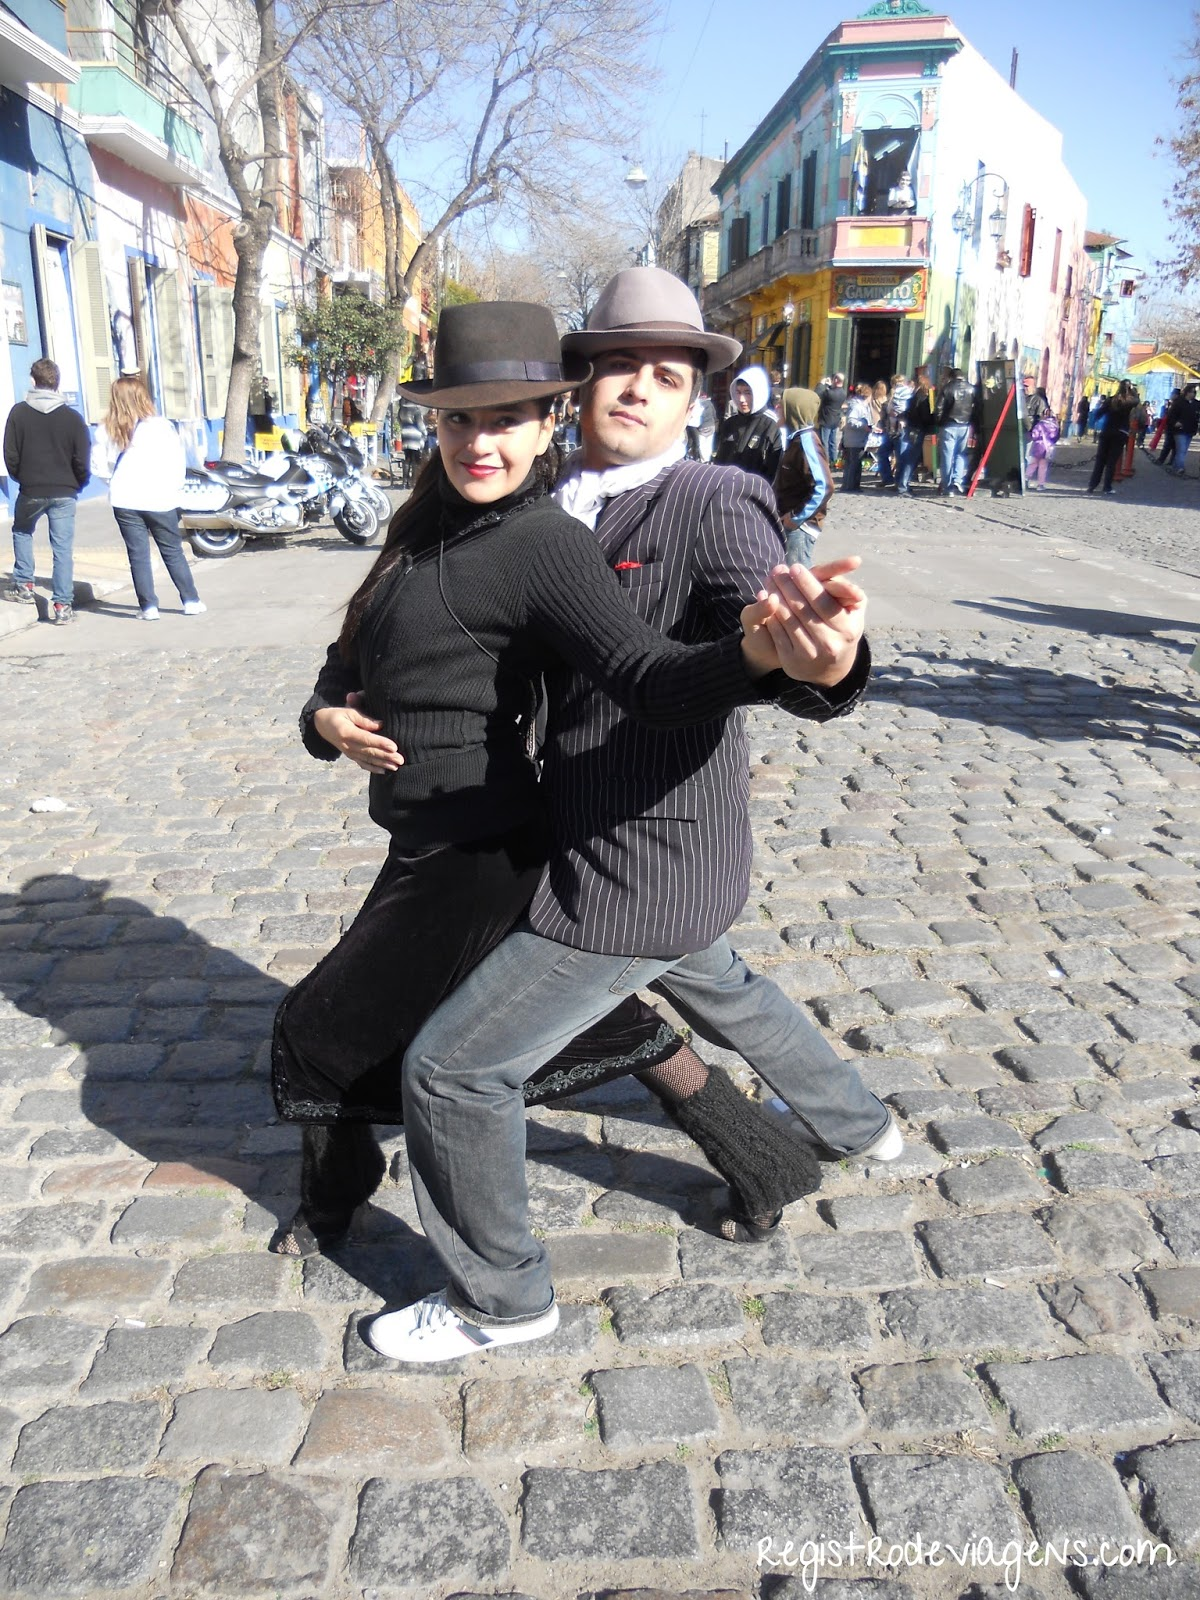 Registro de Viagens: Buenos Aires: Passeando pelo Caminito